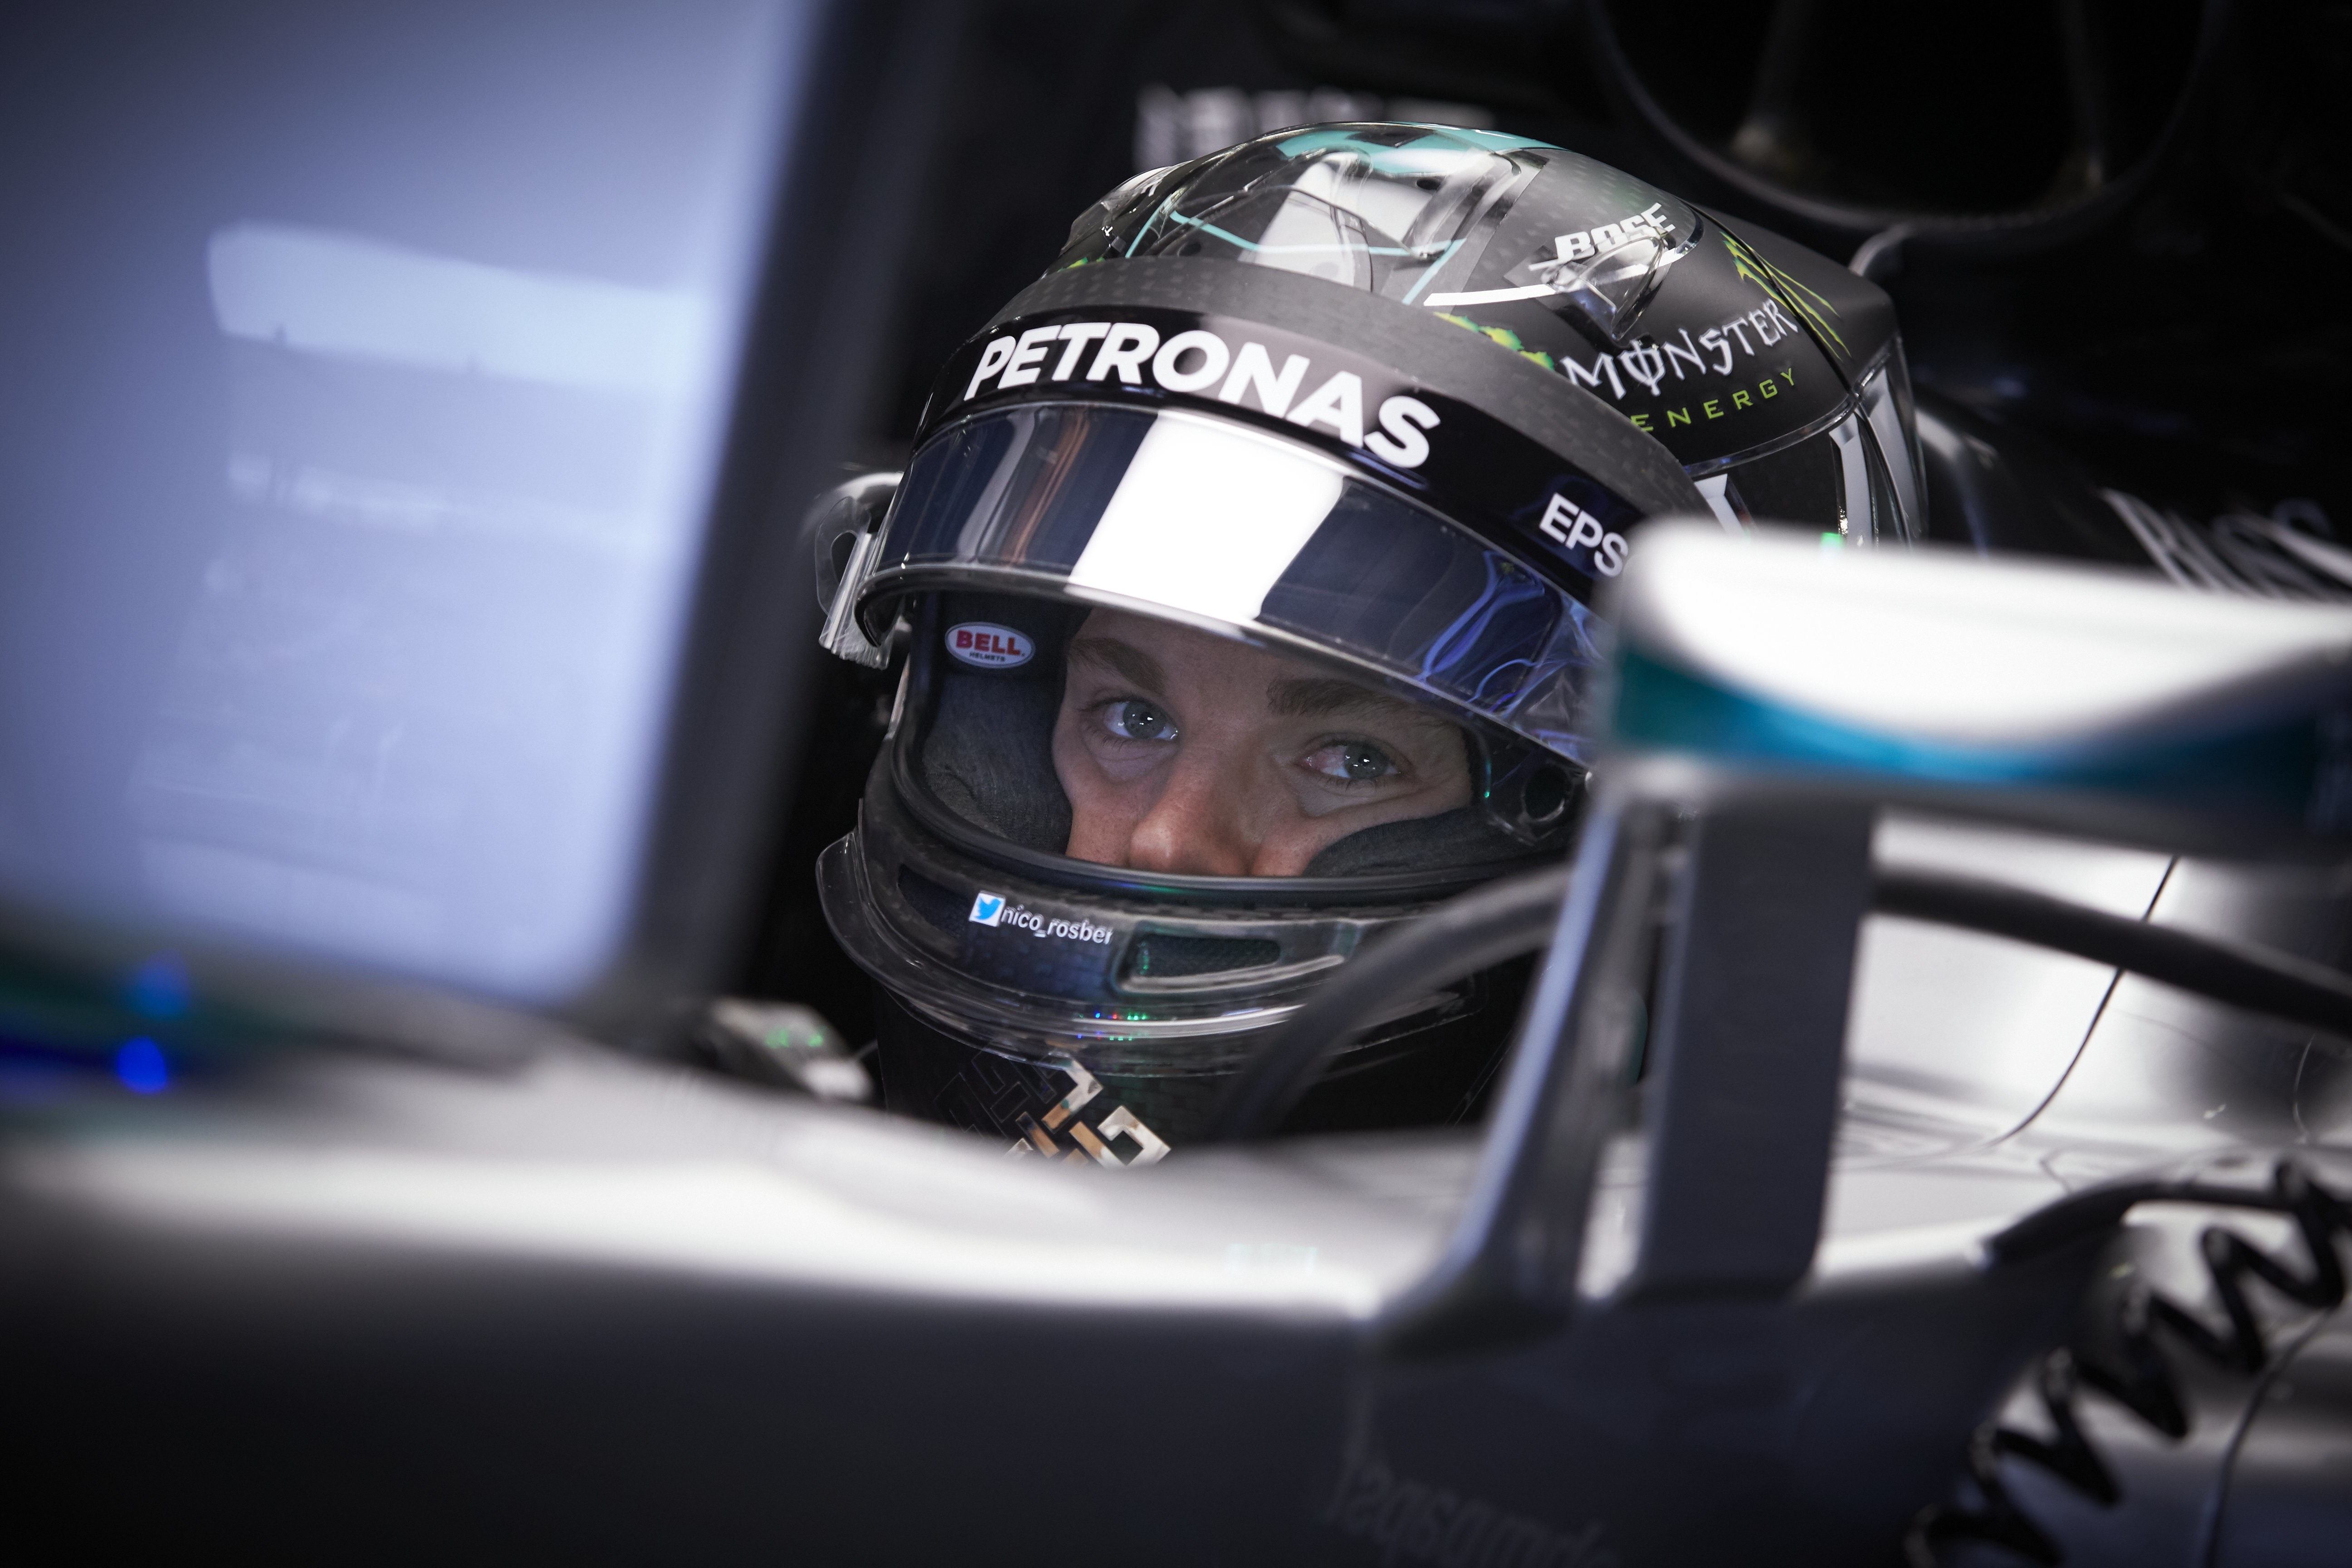 Nico Rosberg (Mercedes) au Grand Prix du Mexique 2016